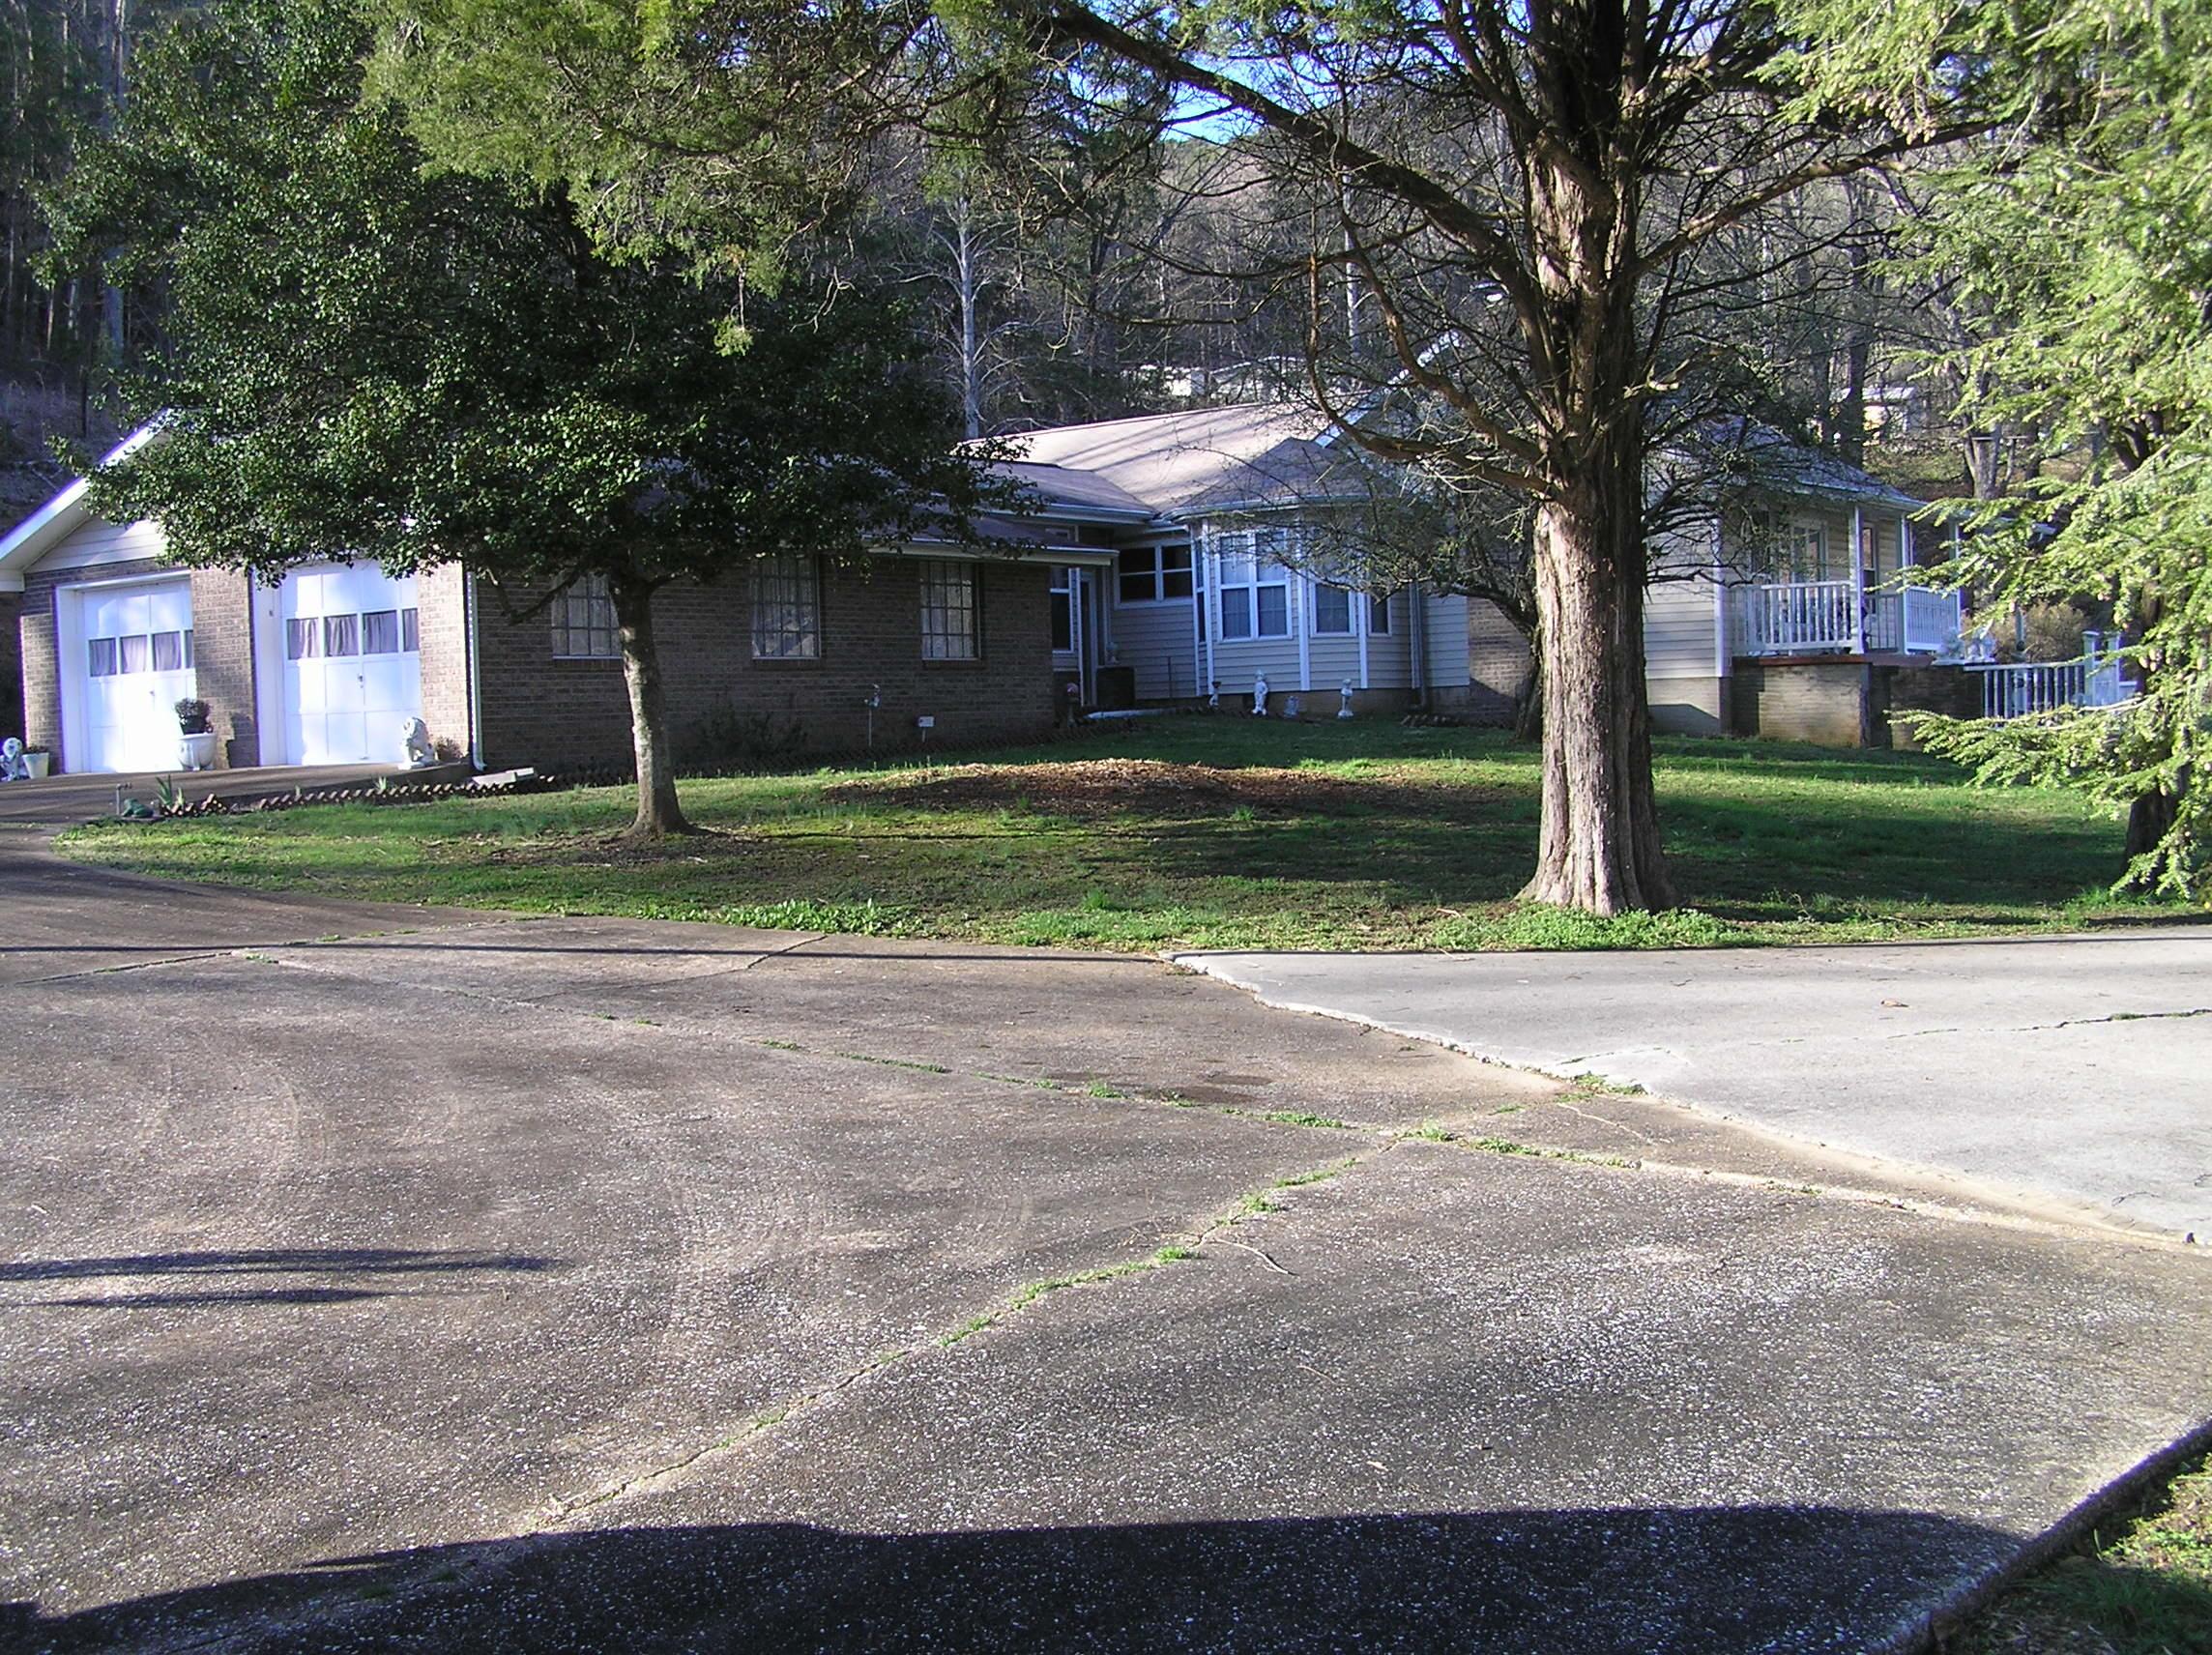 238 Cox Lane Ln, Soddy Daisy, TN 37379